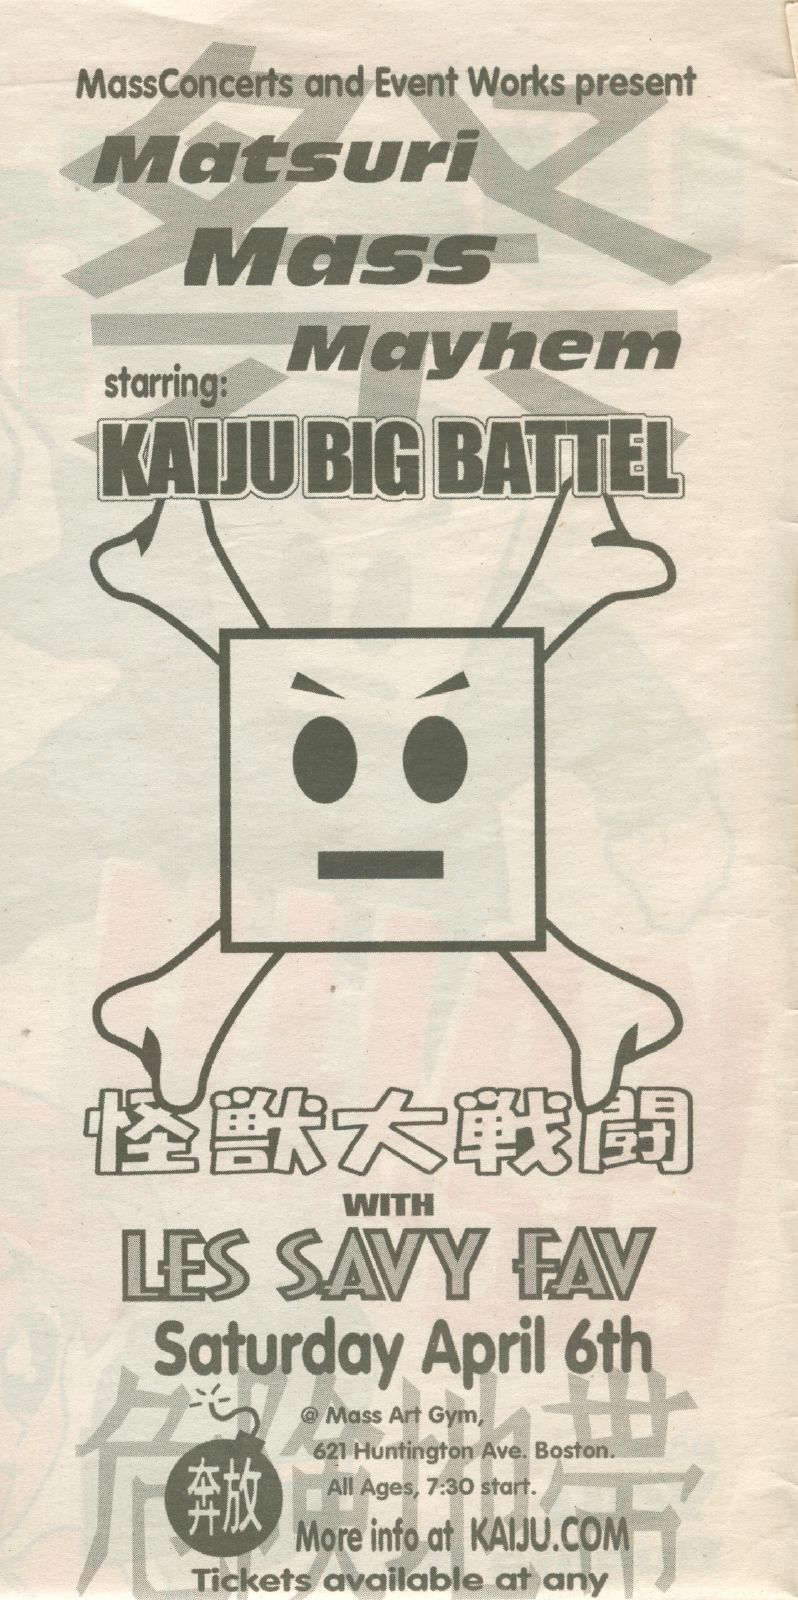 kaiju-big-battel-les-savy-fav-phoniex-ad-040602-_2056604868_o.jpg